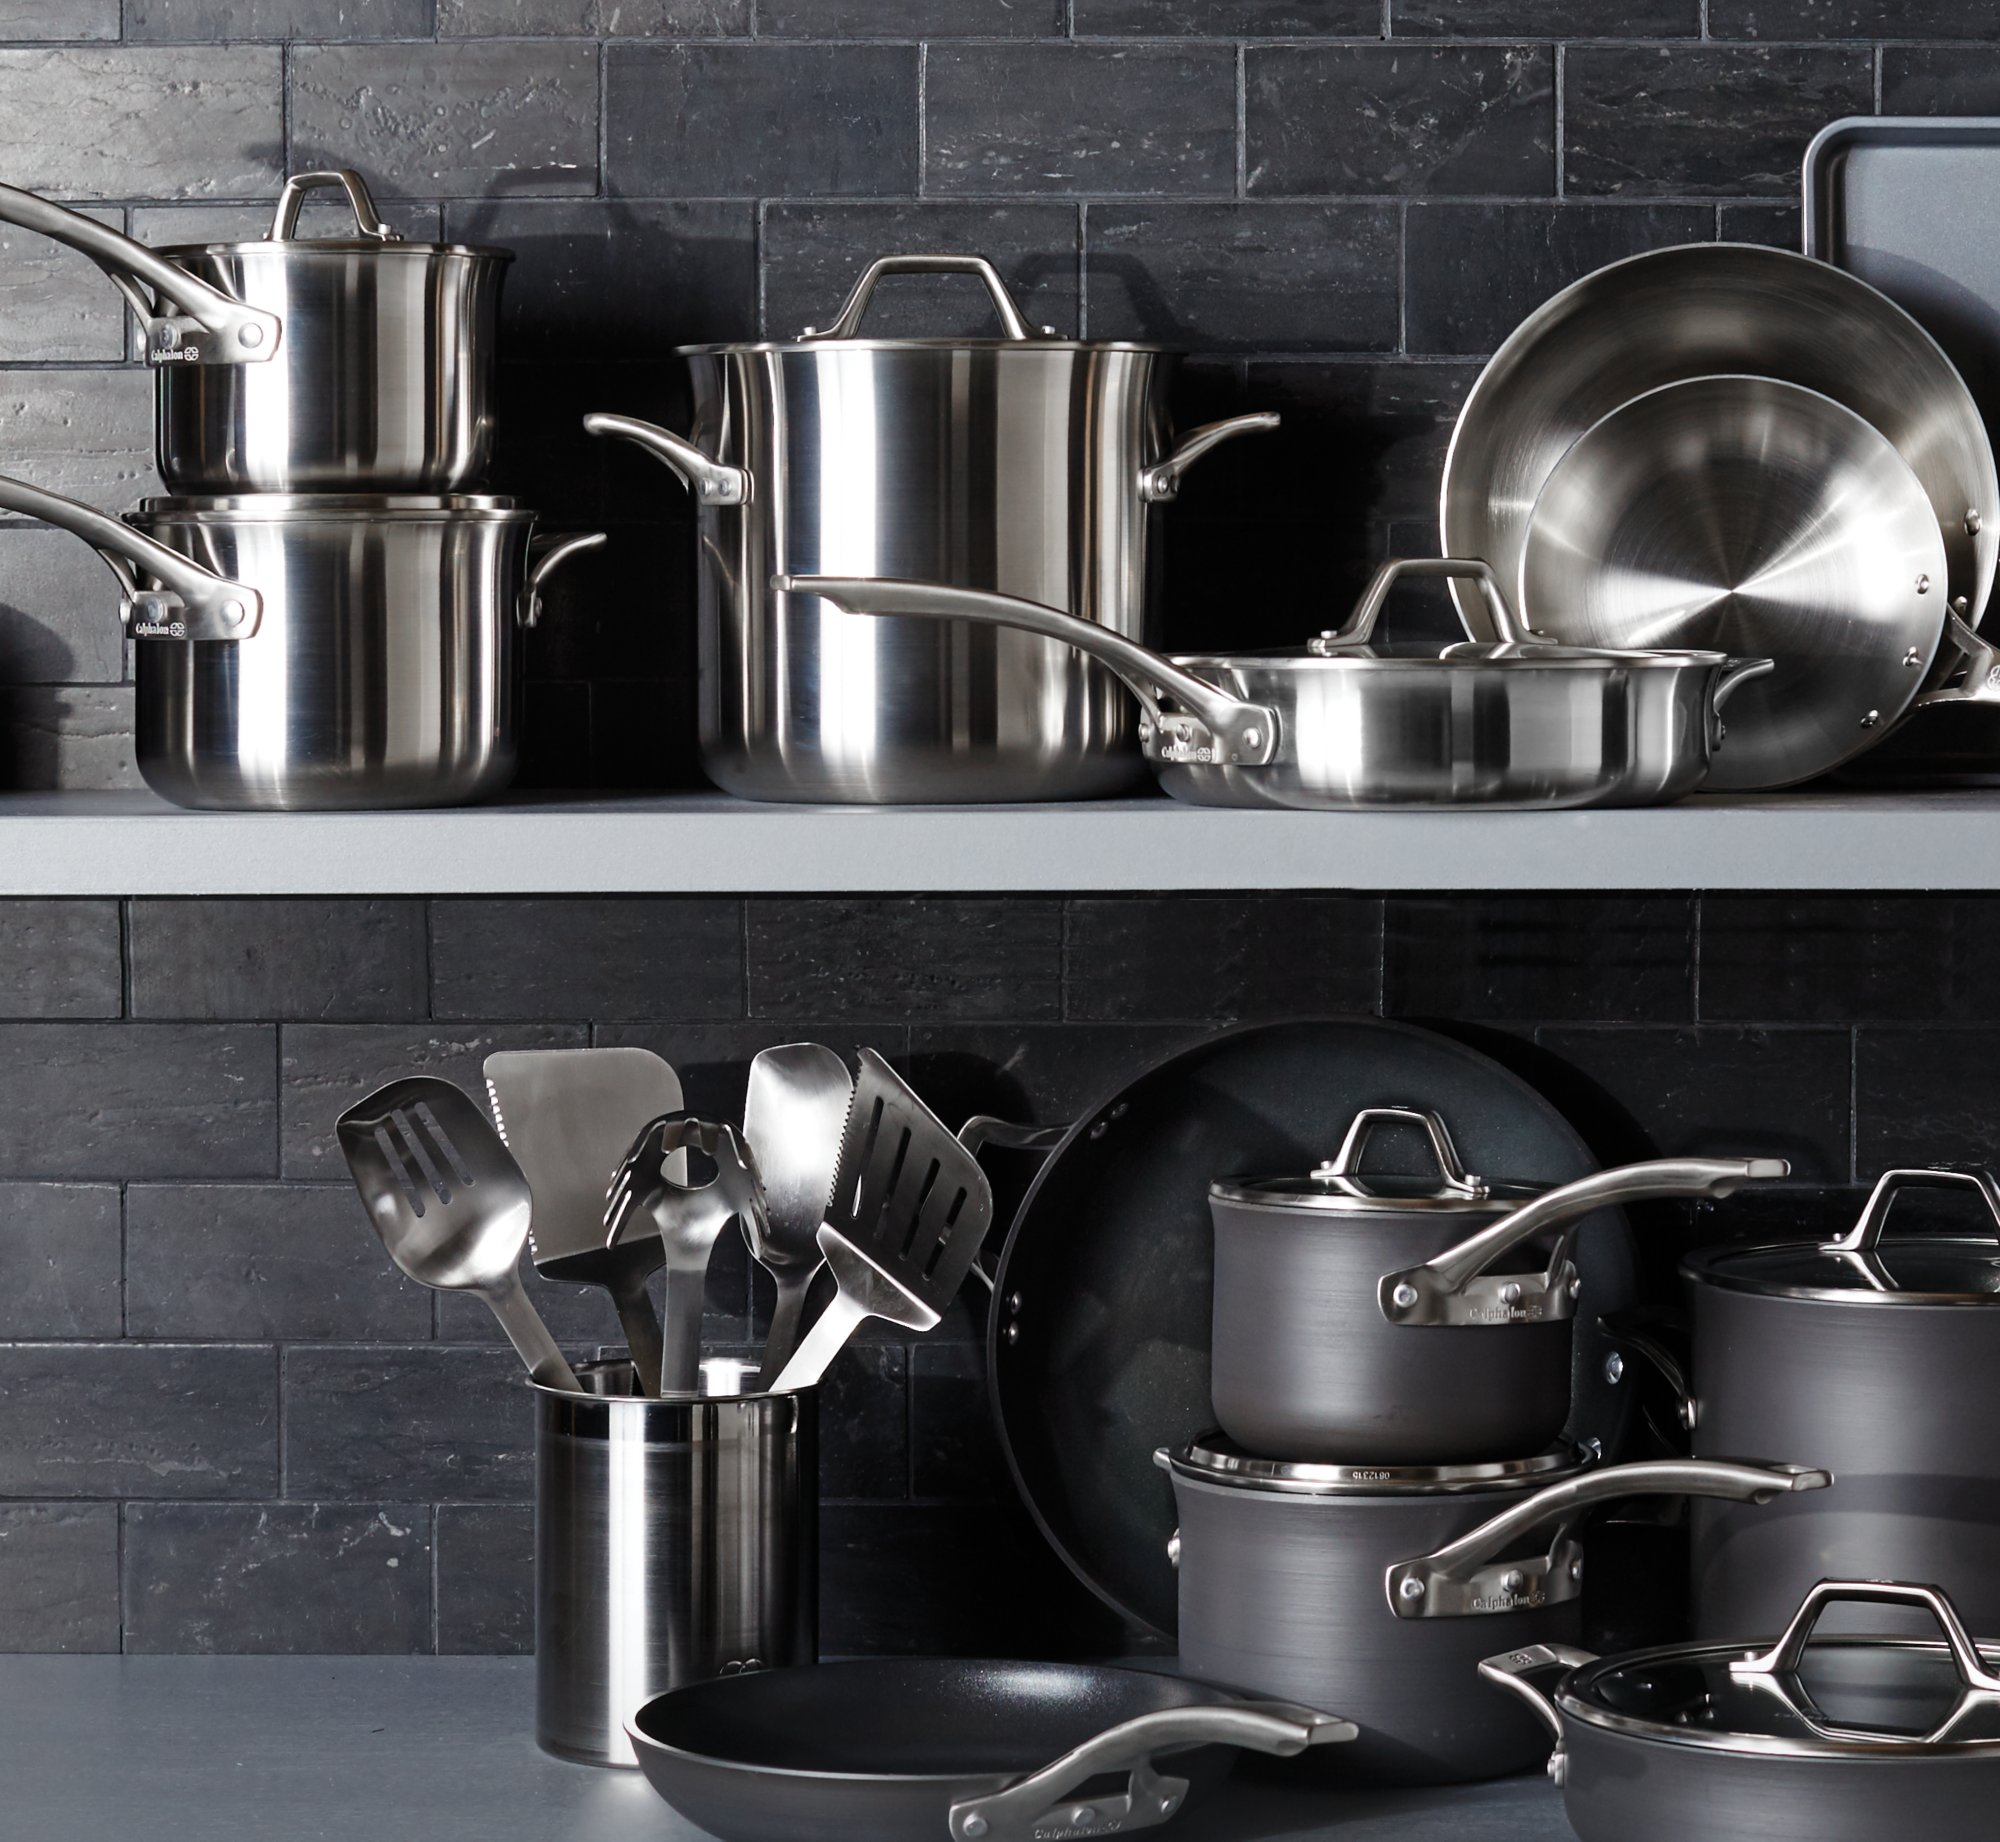 Calphalon Cookware Cutlery Bakeware Kitchenware Amp More